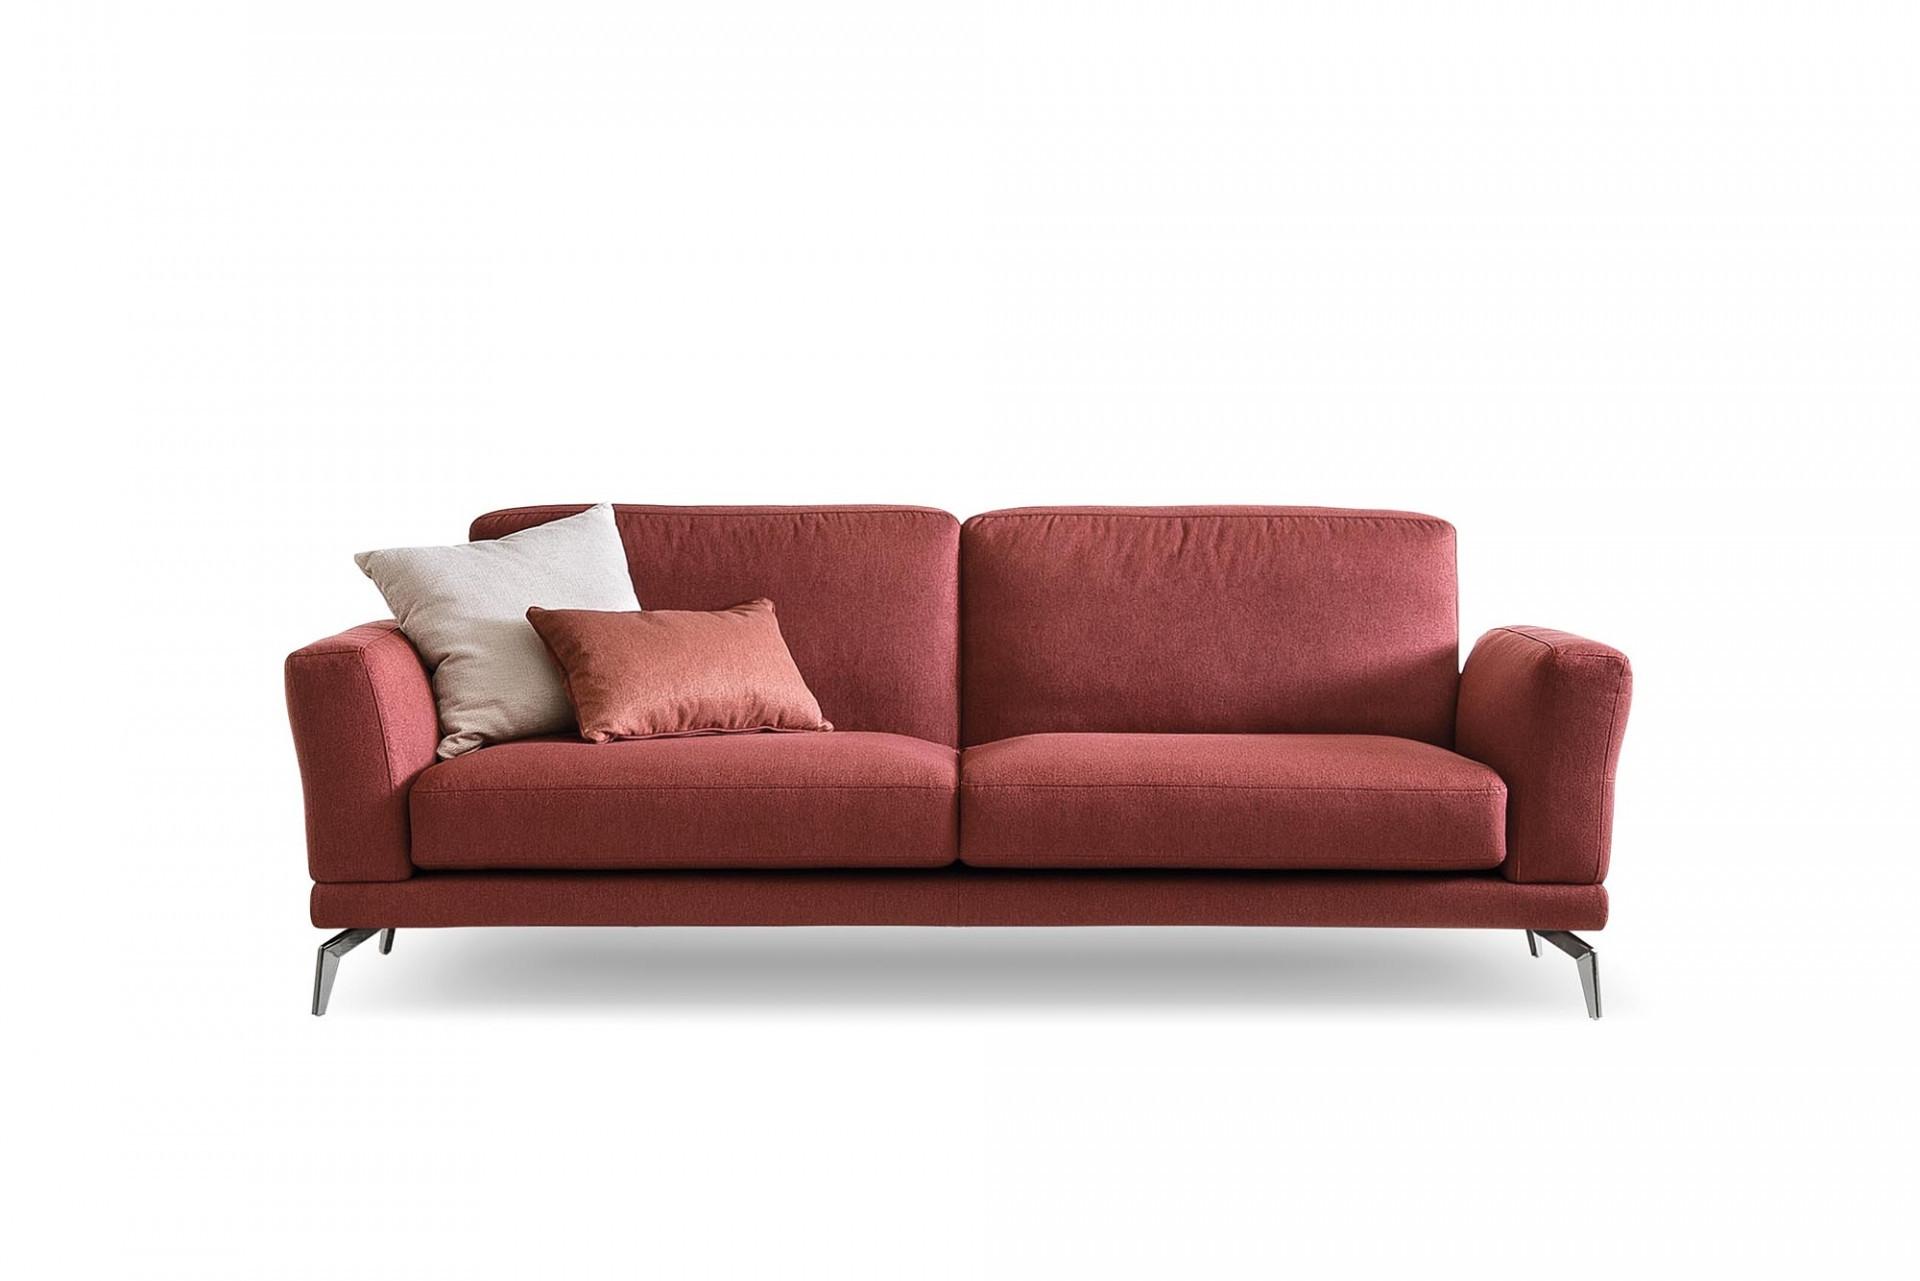 Canapea fixa 3 locuri, tapitata cu stofa, Estate Visiniu, l232xA90xH84 cm imagine